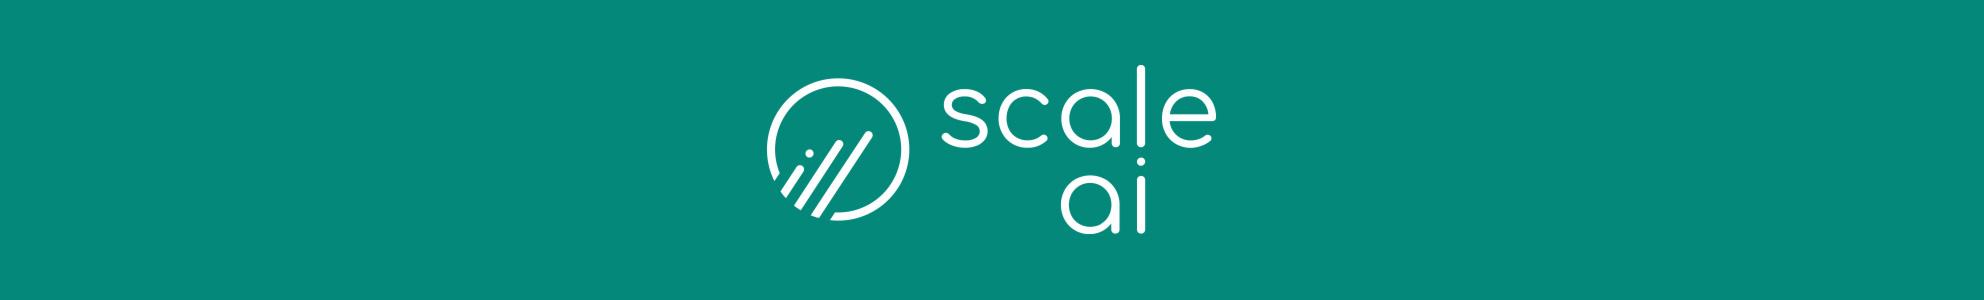 SDG-17958_Hubspot_ed_ScaleAI_1984x300px